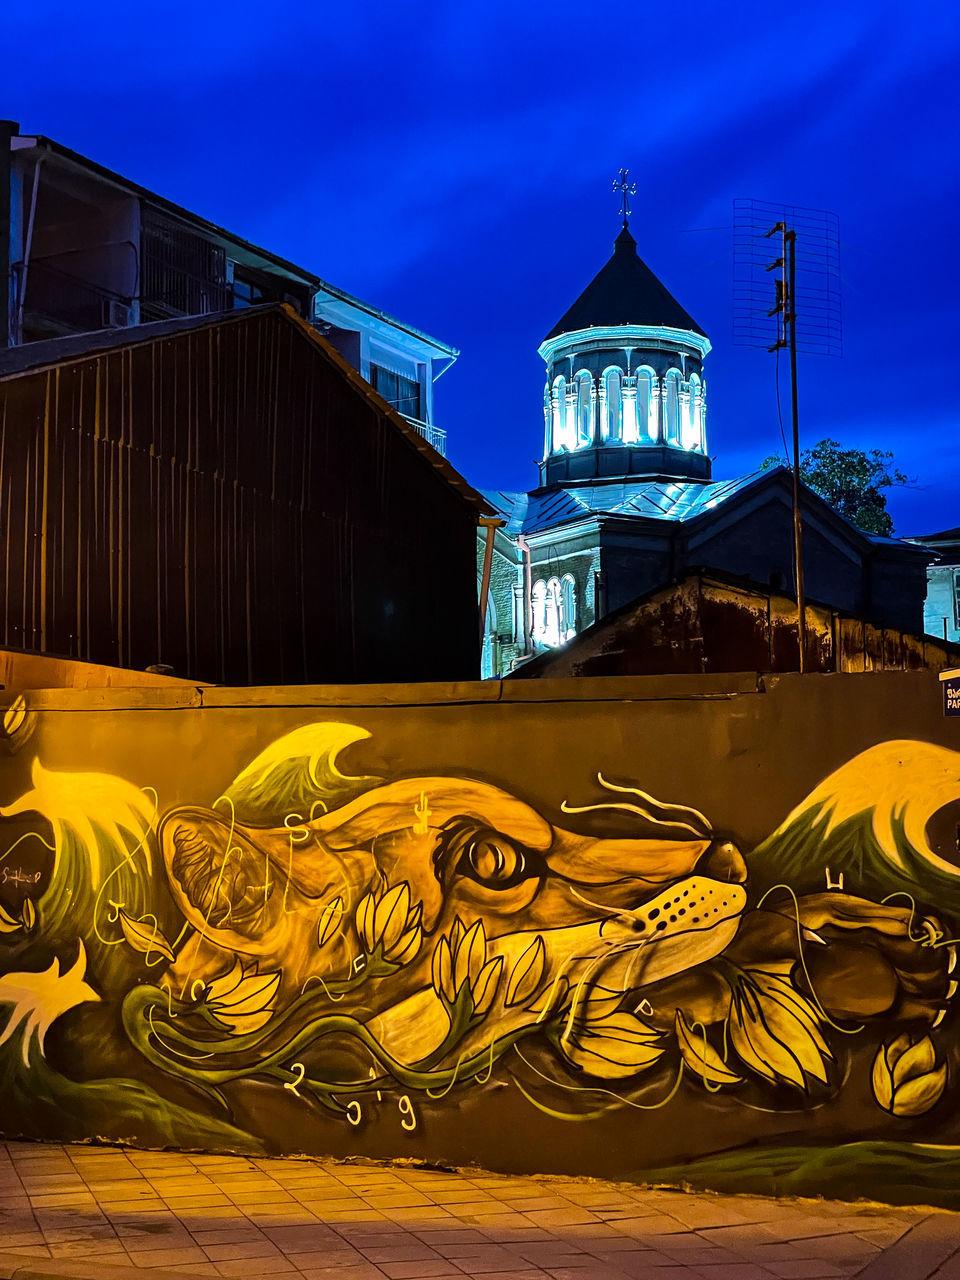 GRAFFITI ON ILLUMINATED BUILDING AT NIGHT